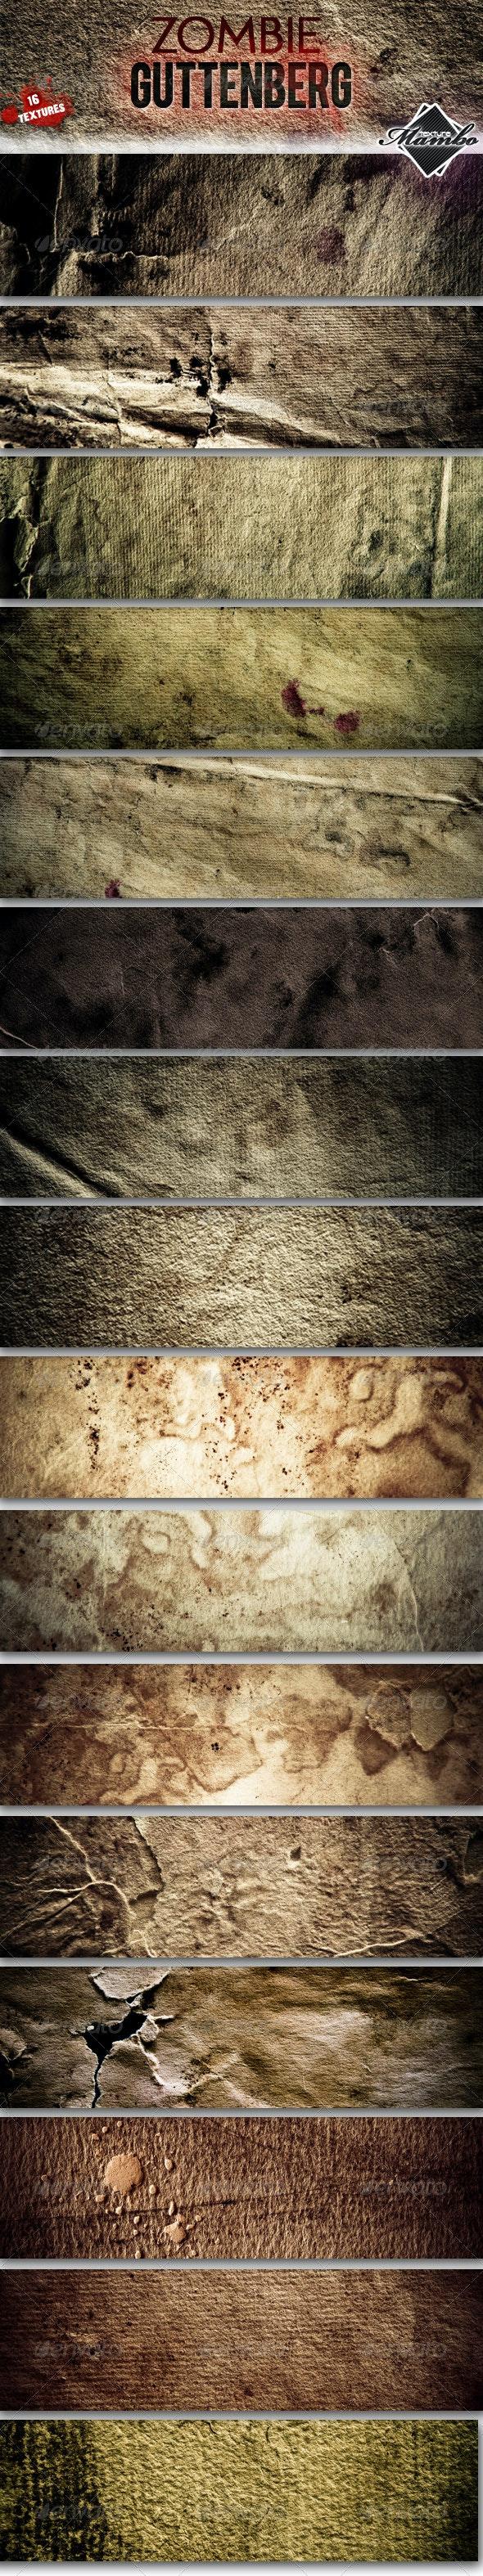 Zombie Guttenberg - Paper textures - Industrial / Grunge Textures